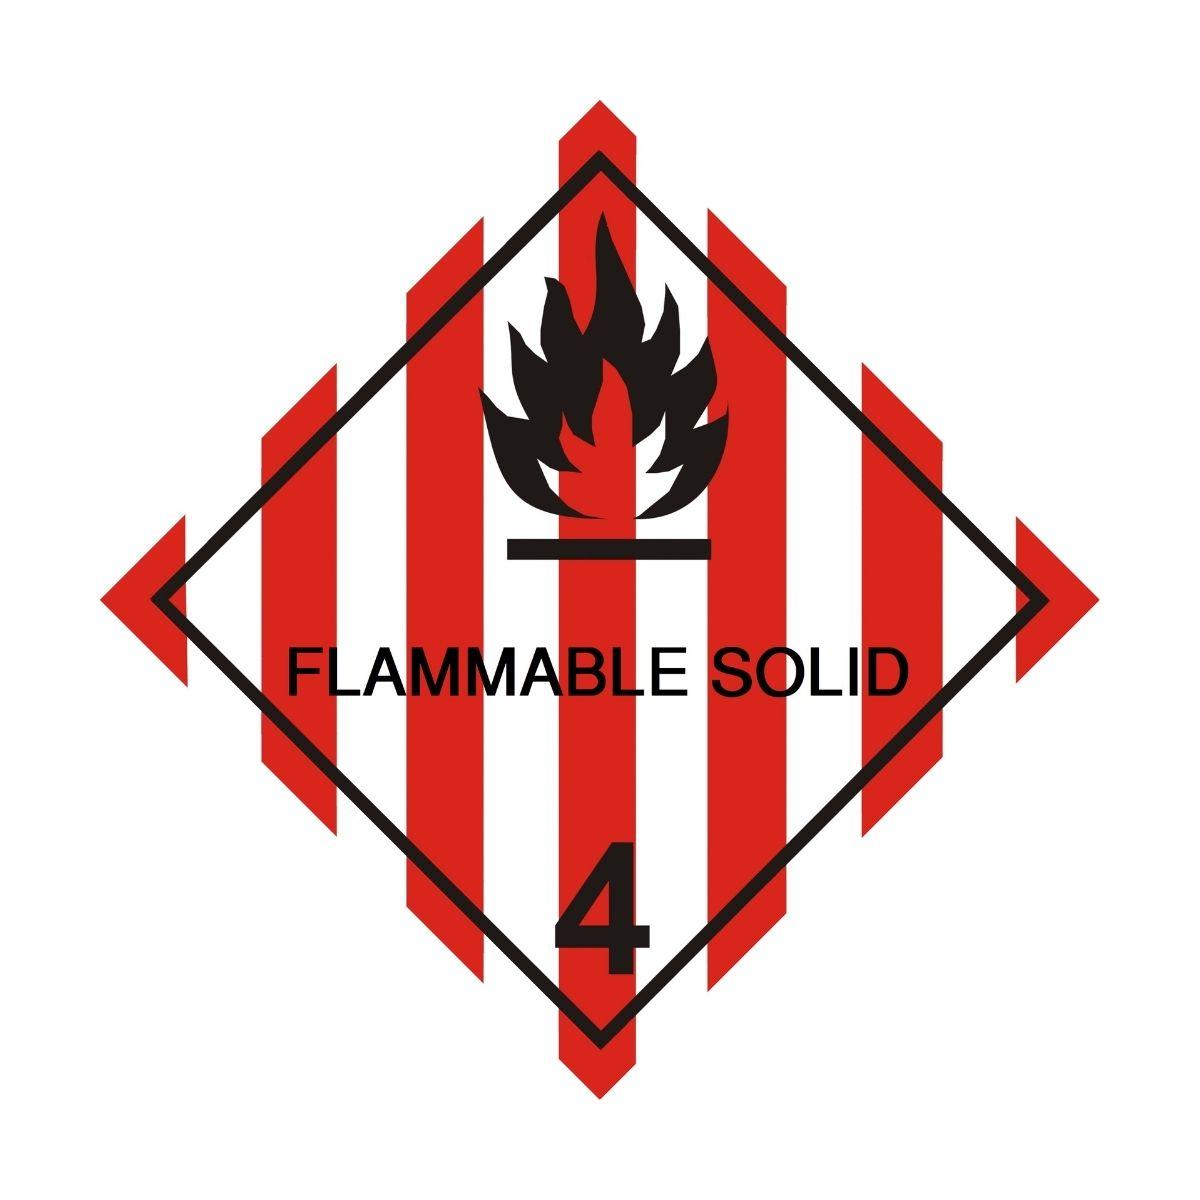 HD1401 UN Hazard Warning Diamond Class 4.1 Flammable Solid